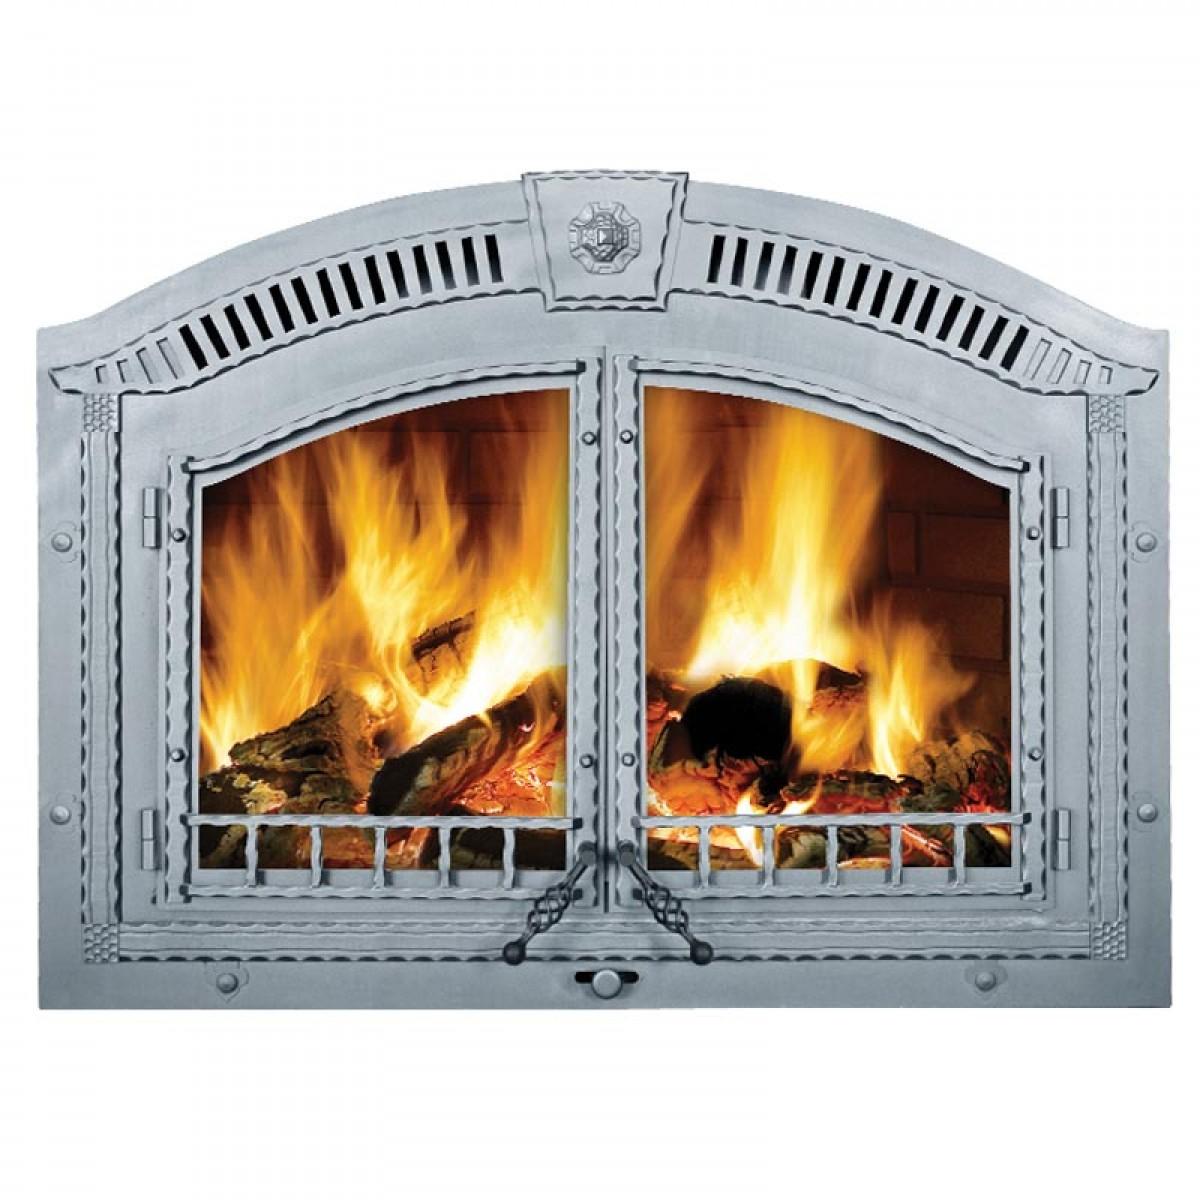 Napoleon nz6000 high country wood burning fireplace napoleon nz6000 high country wood burning fireplace epa certified eventshaper